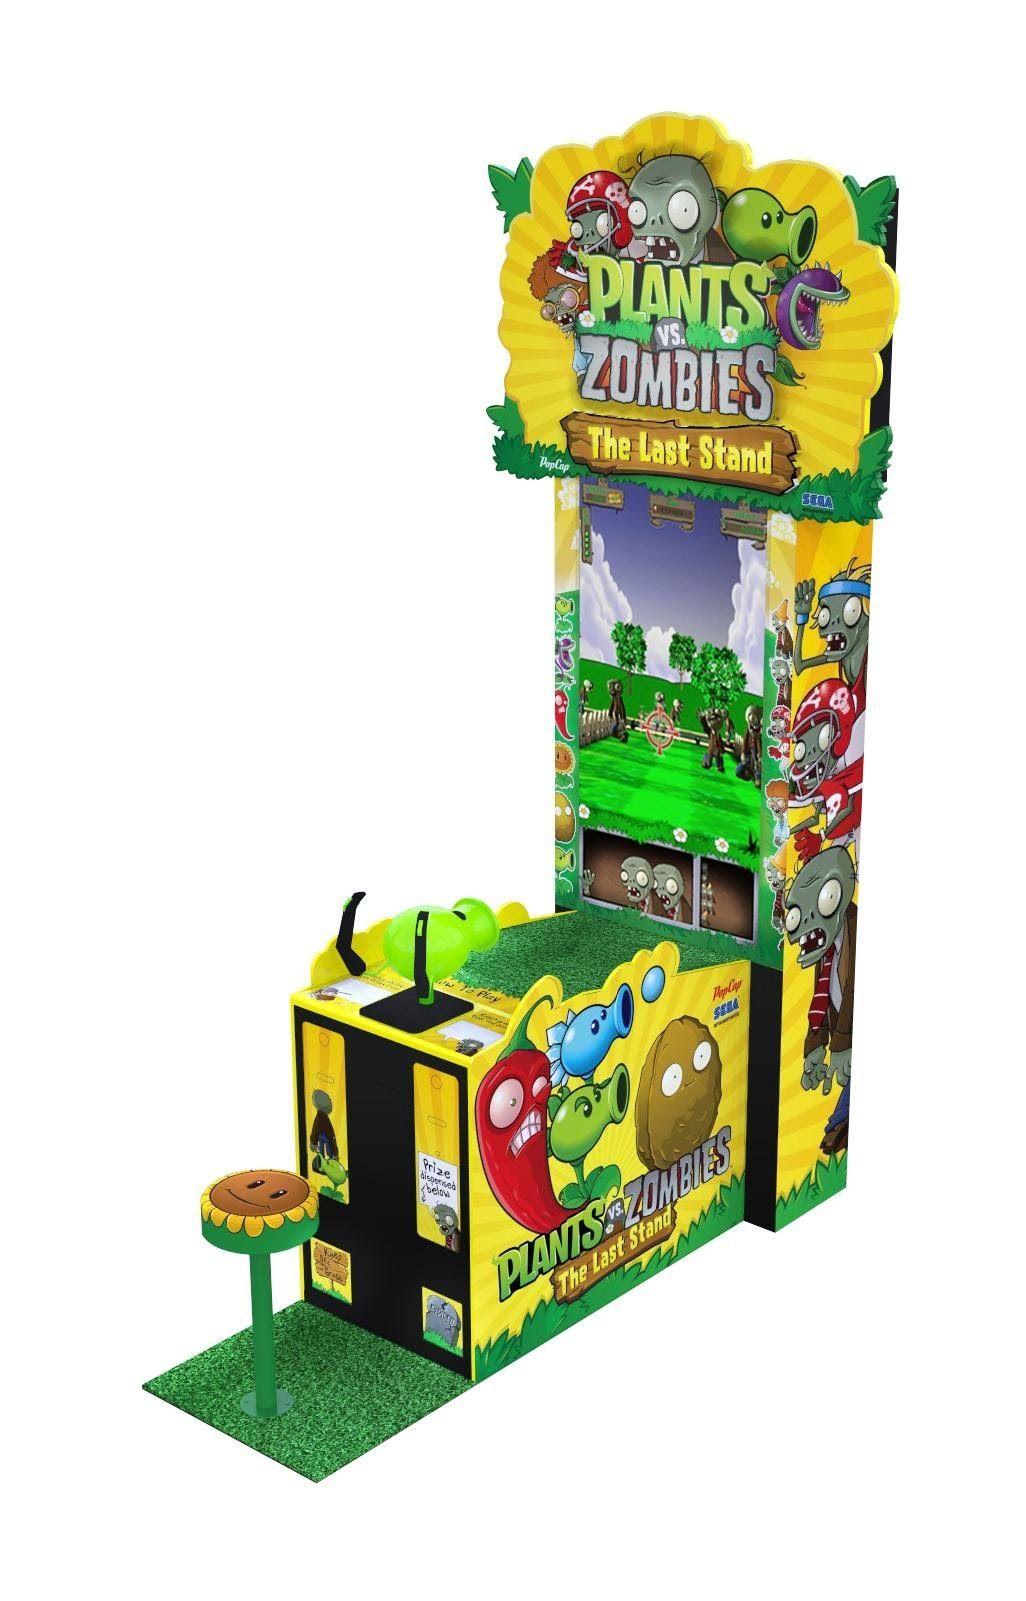 Sega Plants Vs Zombies the Last Stand by Birmingham